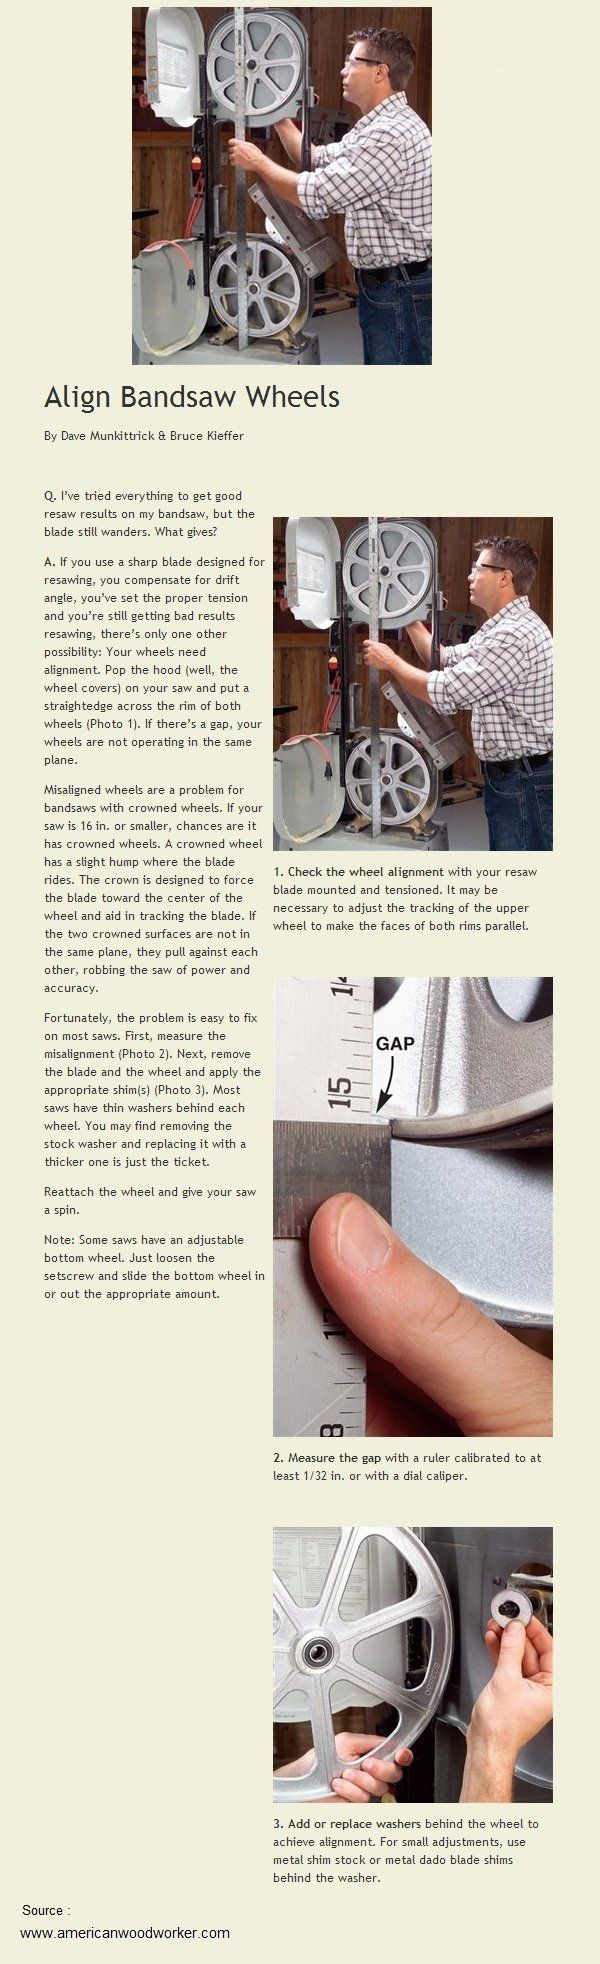 Align Bandsaw Wheels | WoodworkerZ.com